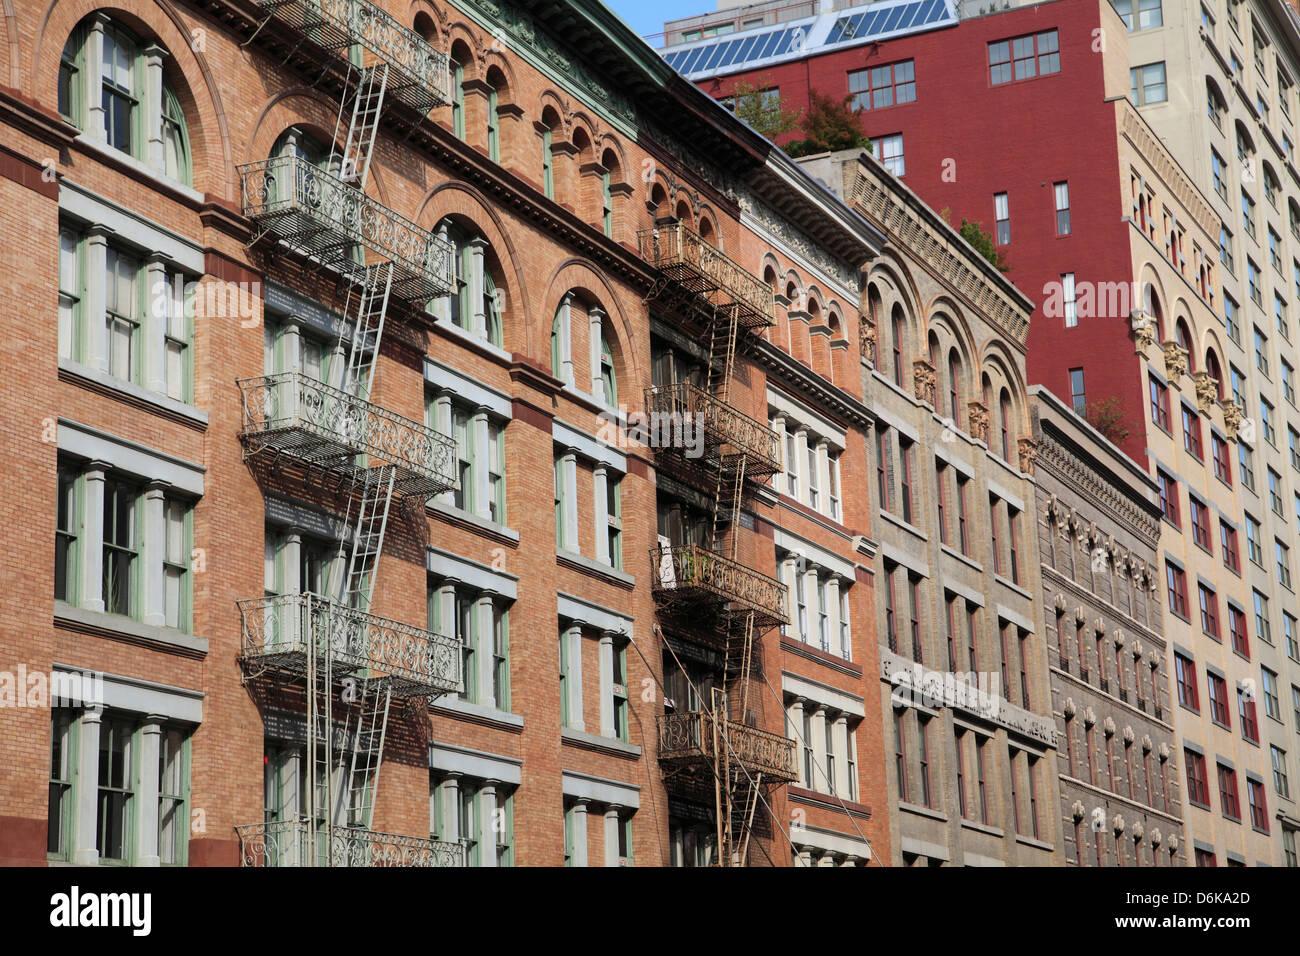 Loft Buildings, Tribeca, Manhattan, New York City, United States of America, North America - Stock Image